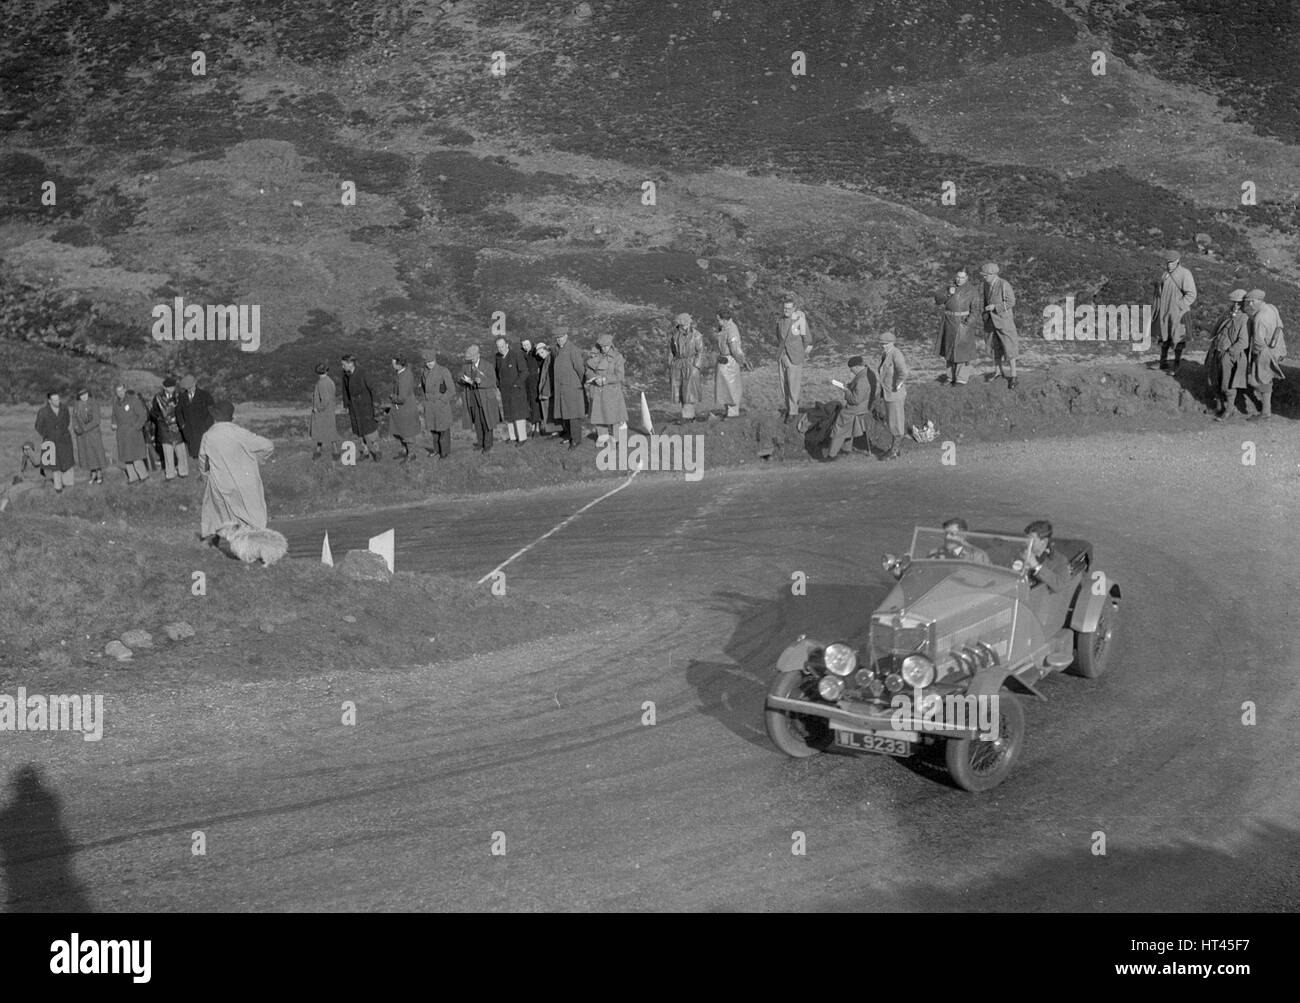 MG 18/80 open 4-seater tourer of GM Cavendish, RSAC Scottish Rally, Devil's Elbow, Glenshee, 1934. Artist: Bill - Stock Image